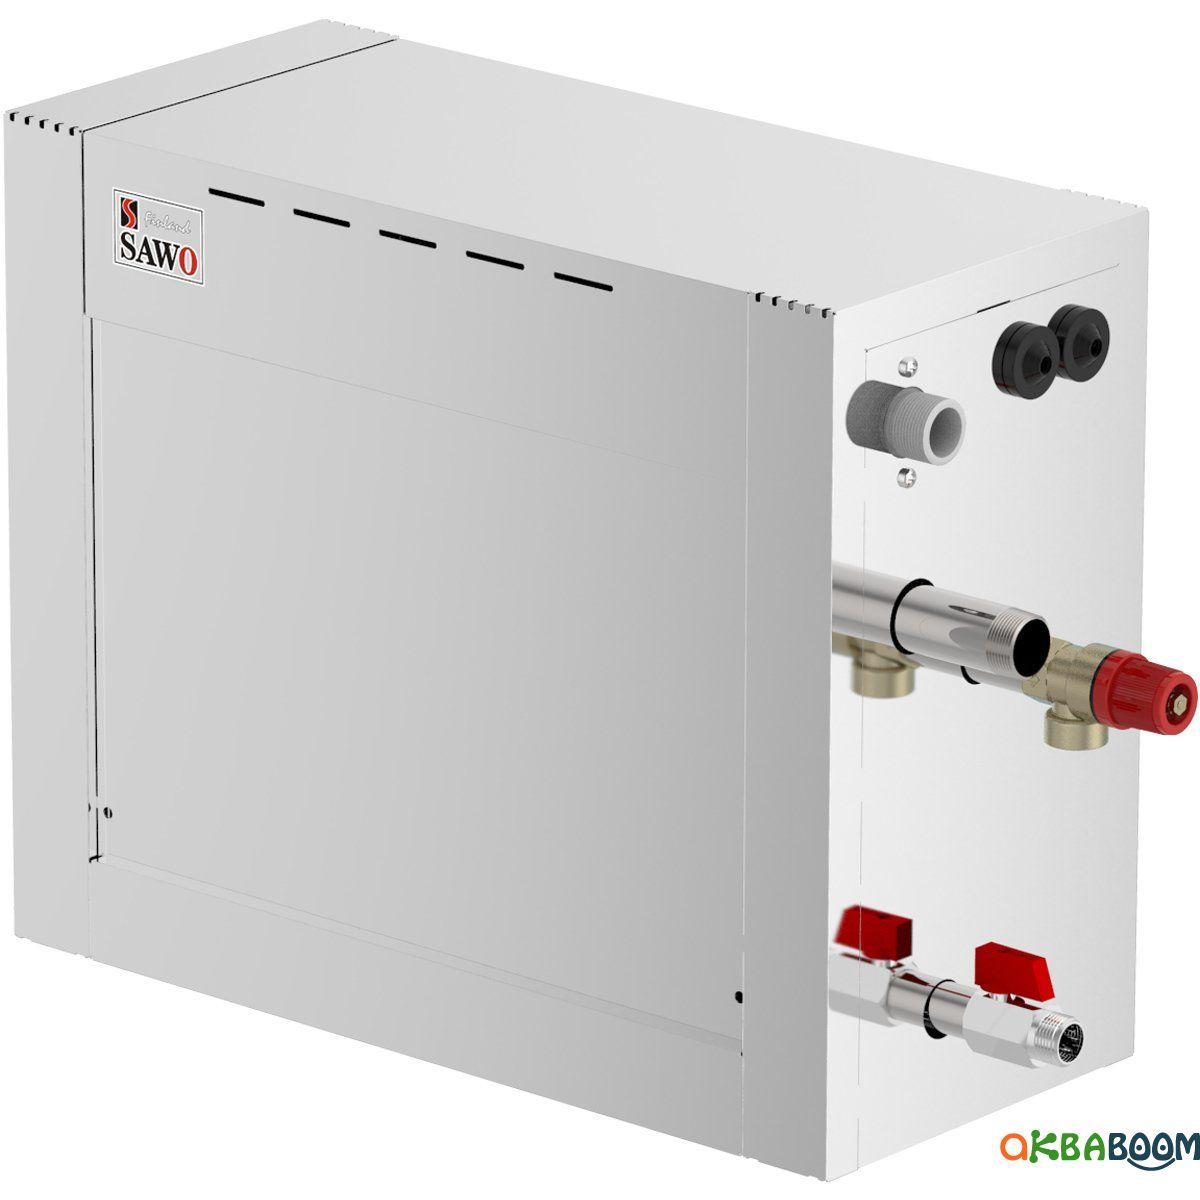 Парогенератор Sawo STE-120 12 кВт с пультом, Парогенераторы, Финляндия, 380, До 28, 12 кВт